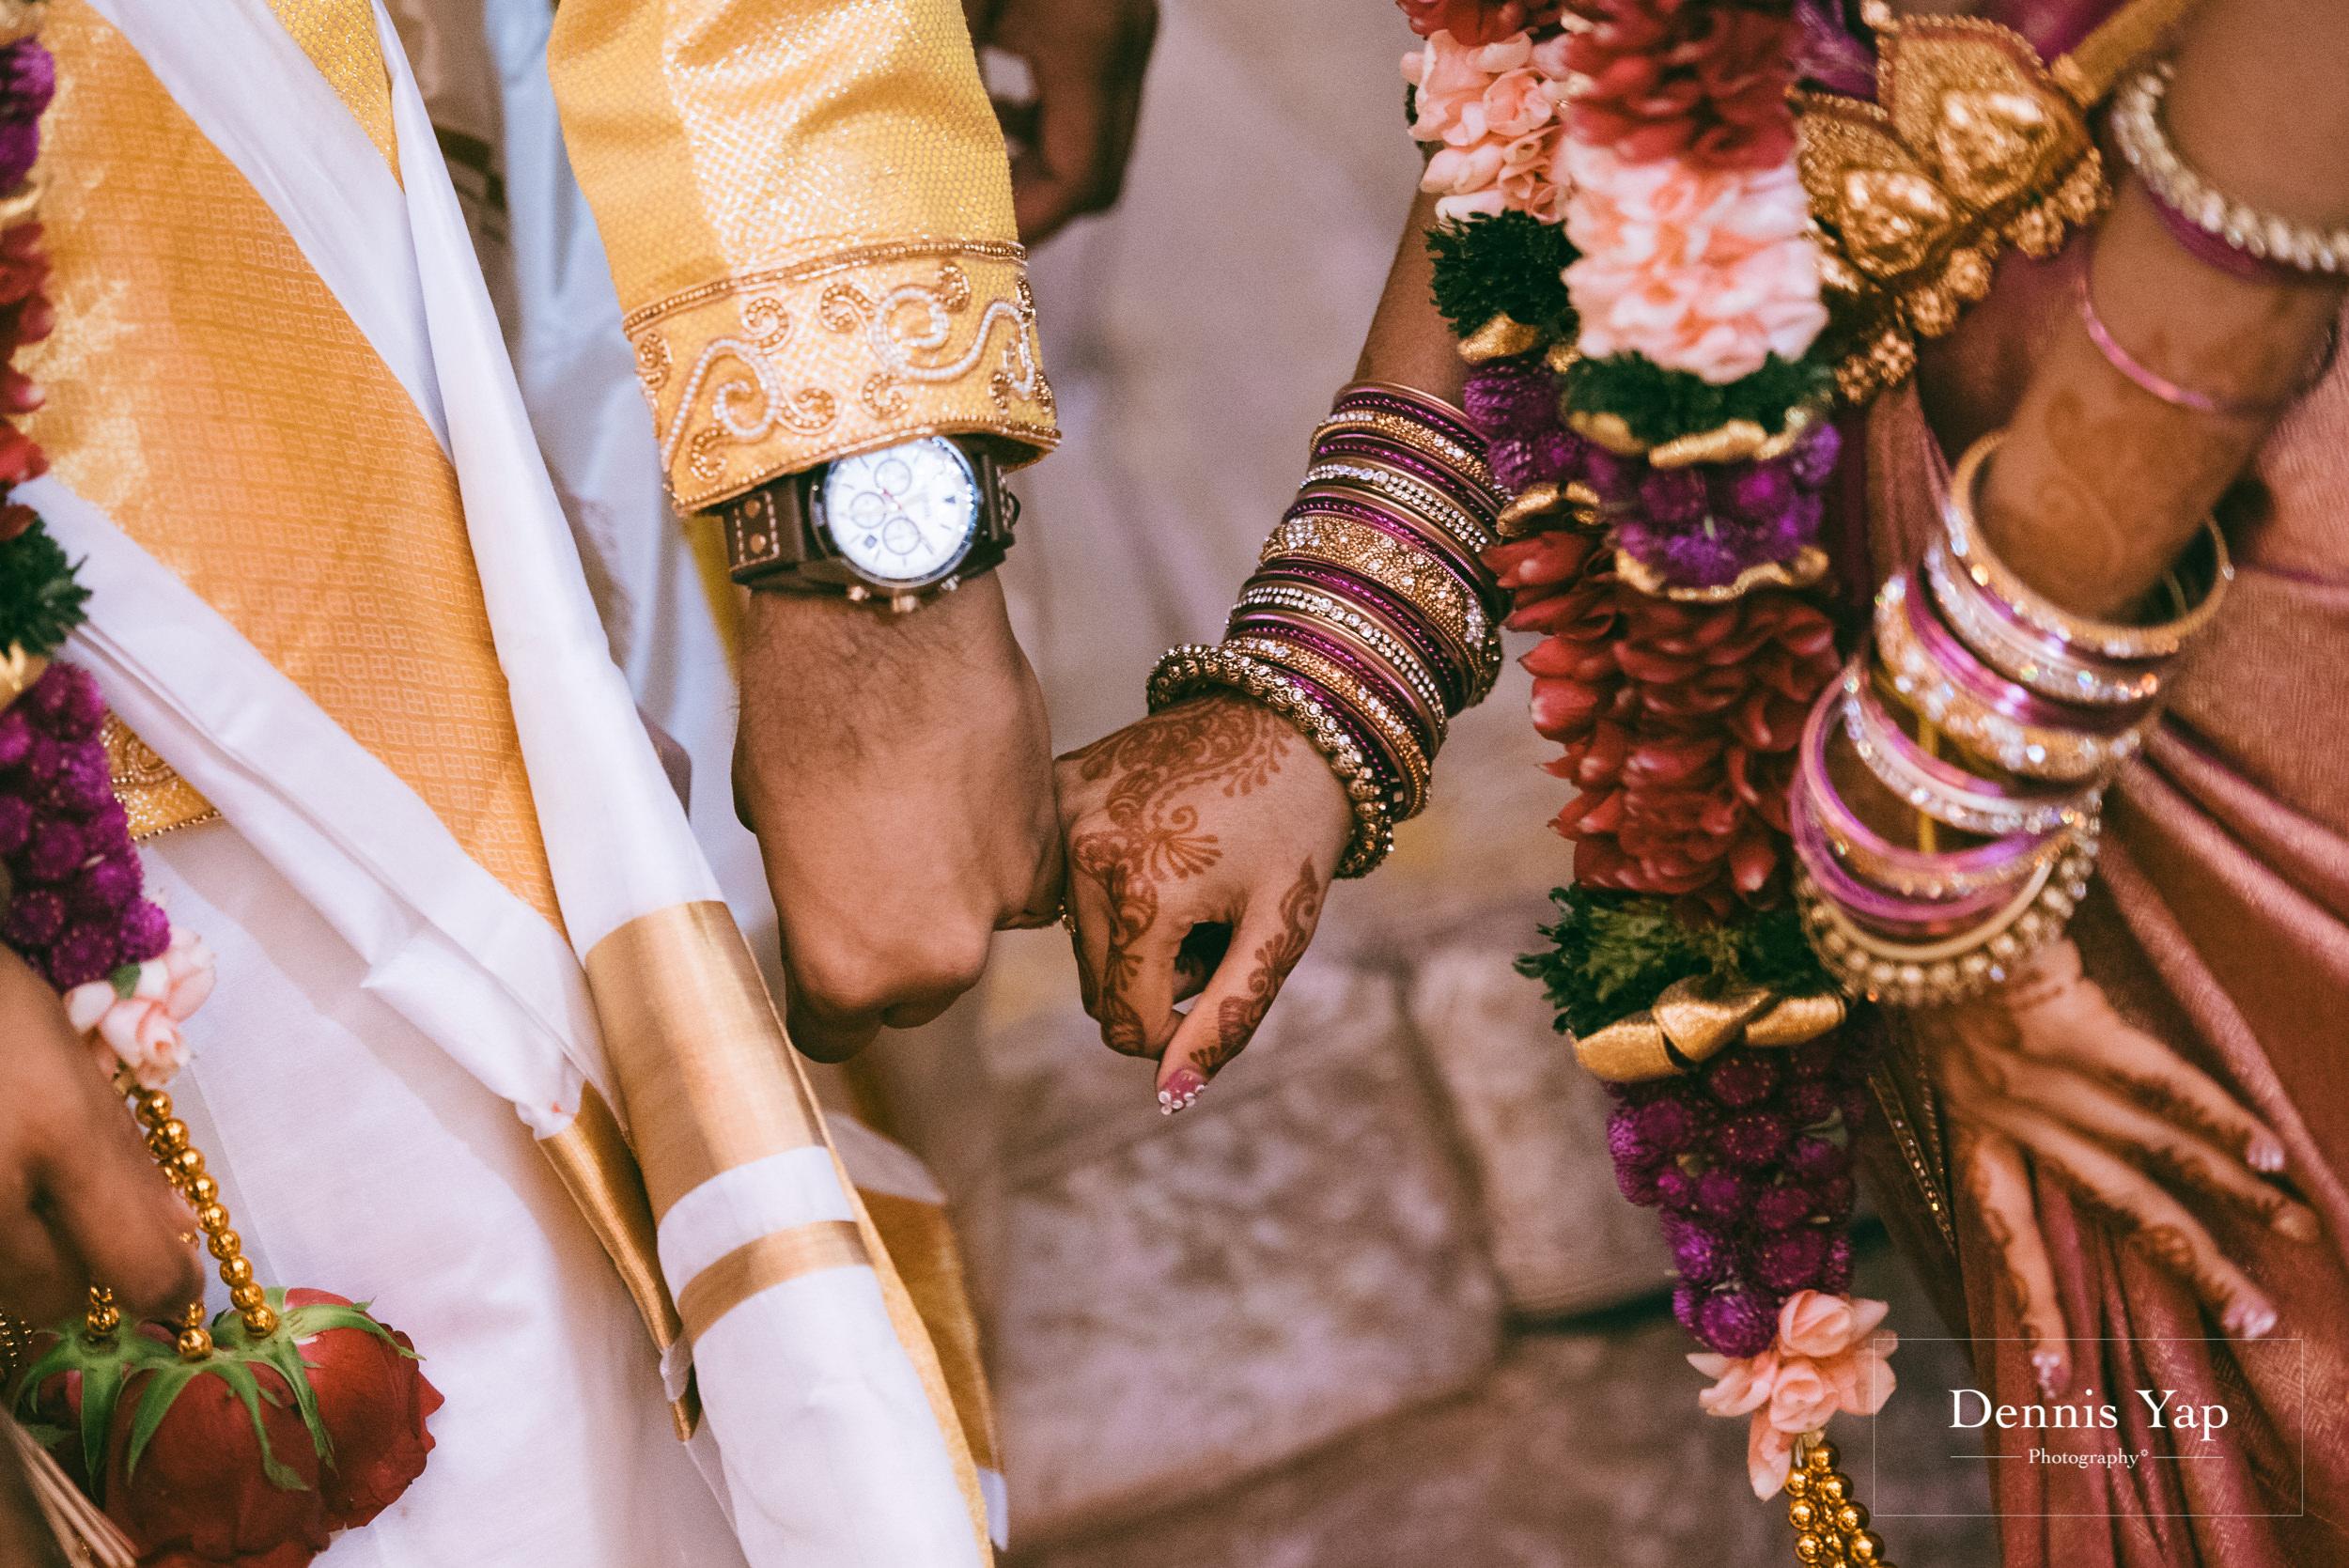 puvaneswaran cangitaa indian wedding ceremony ideal convention dennis yap photography malaysia-26.jpg